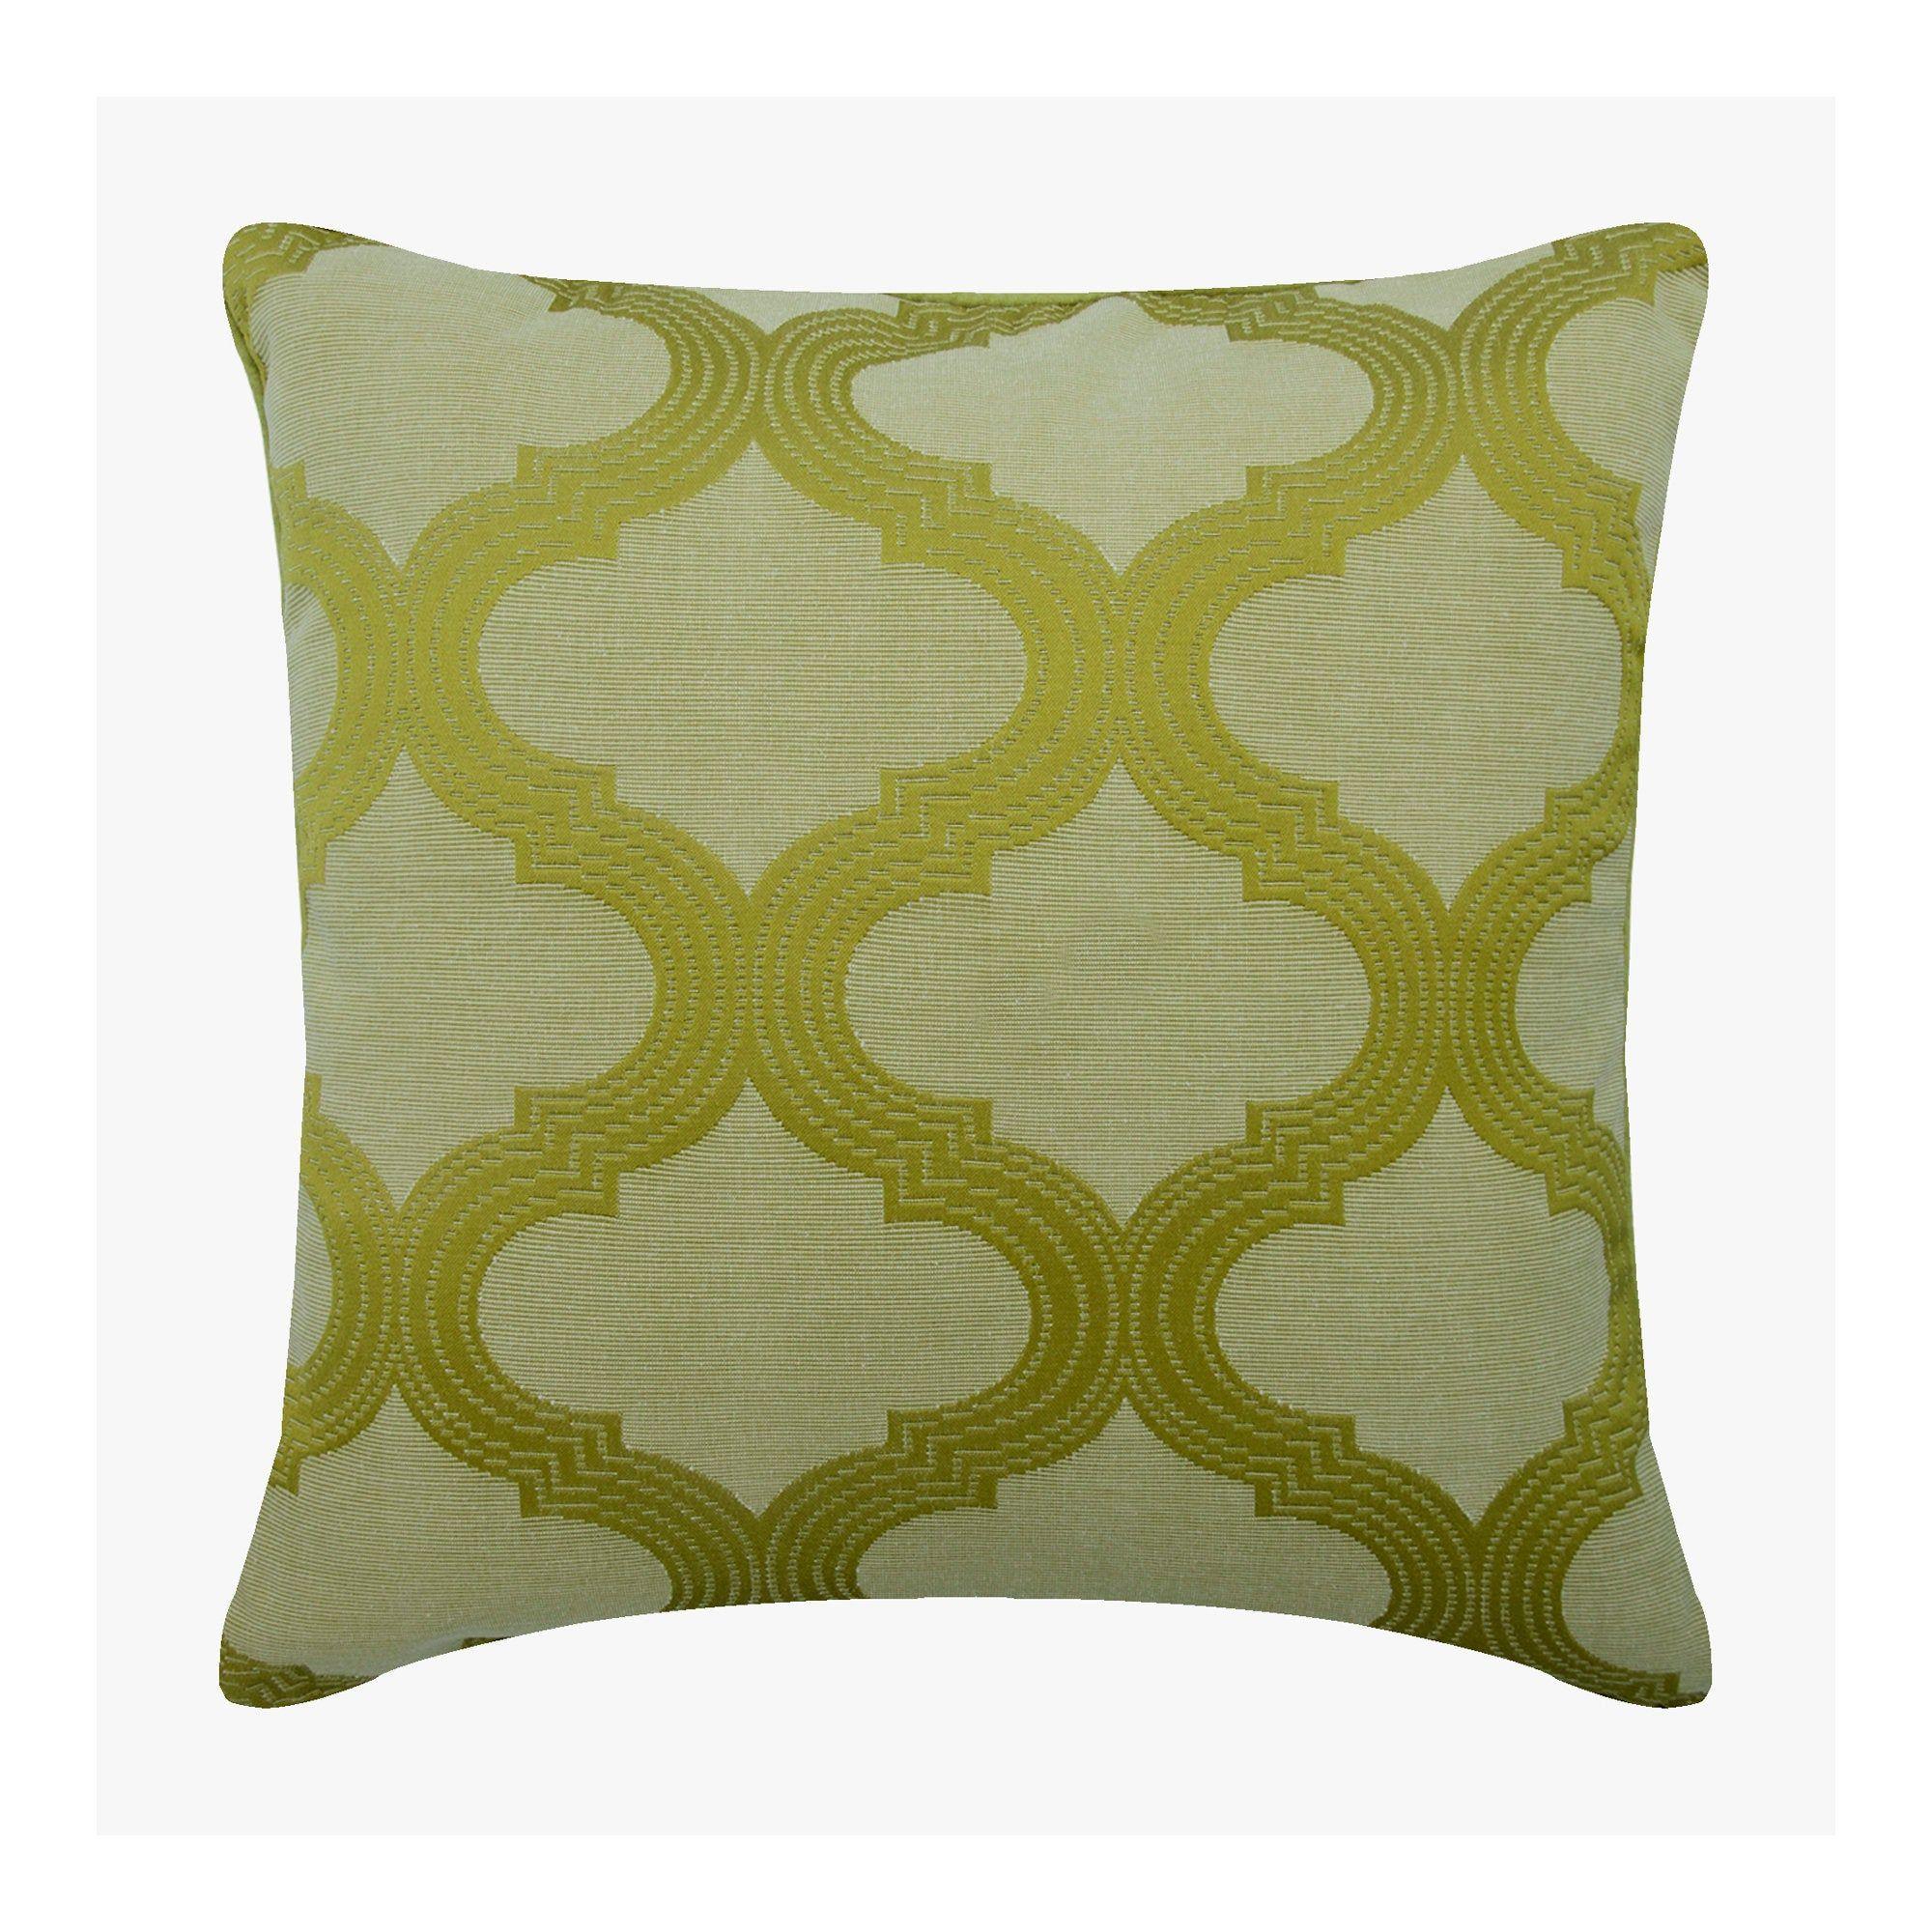 silk green throw pillow cover 16x16